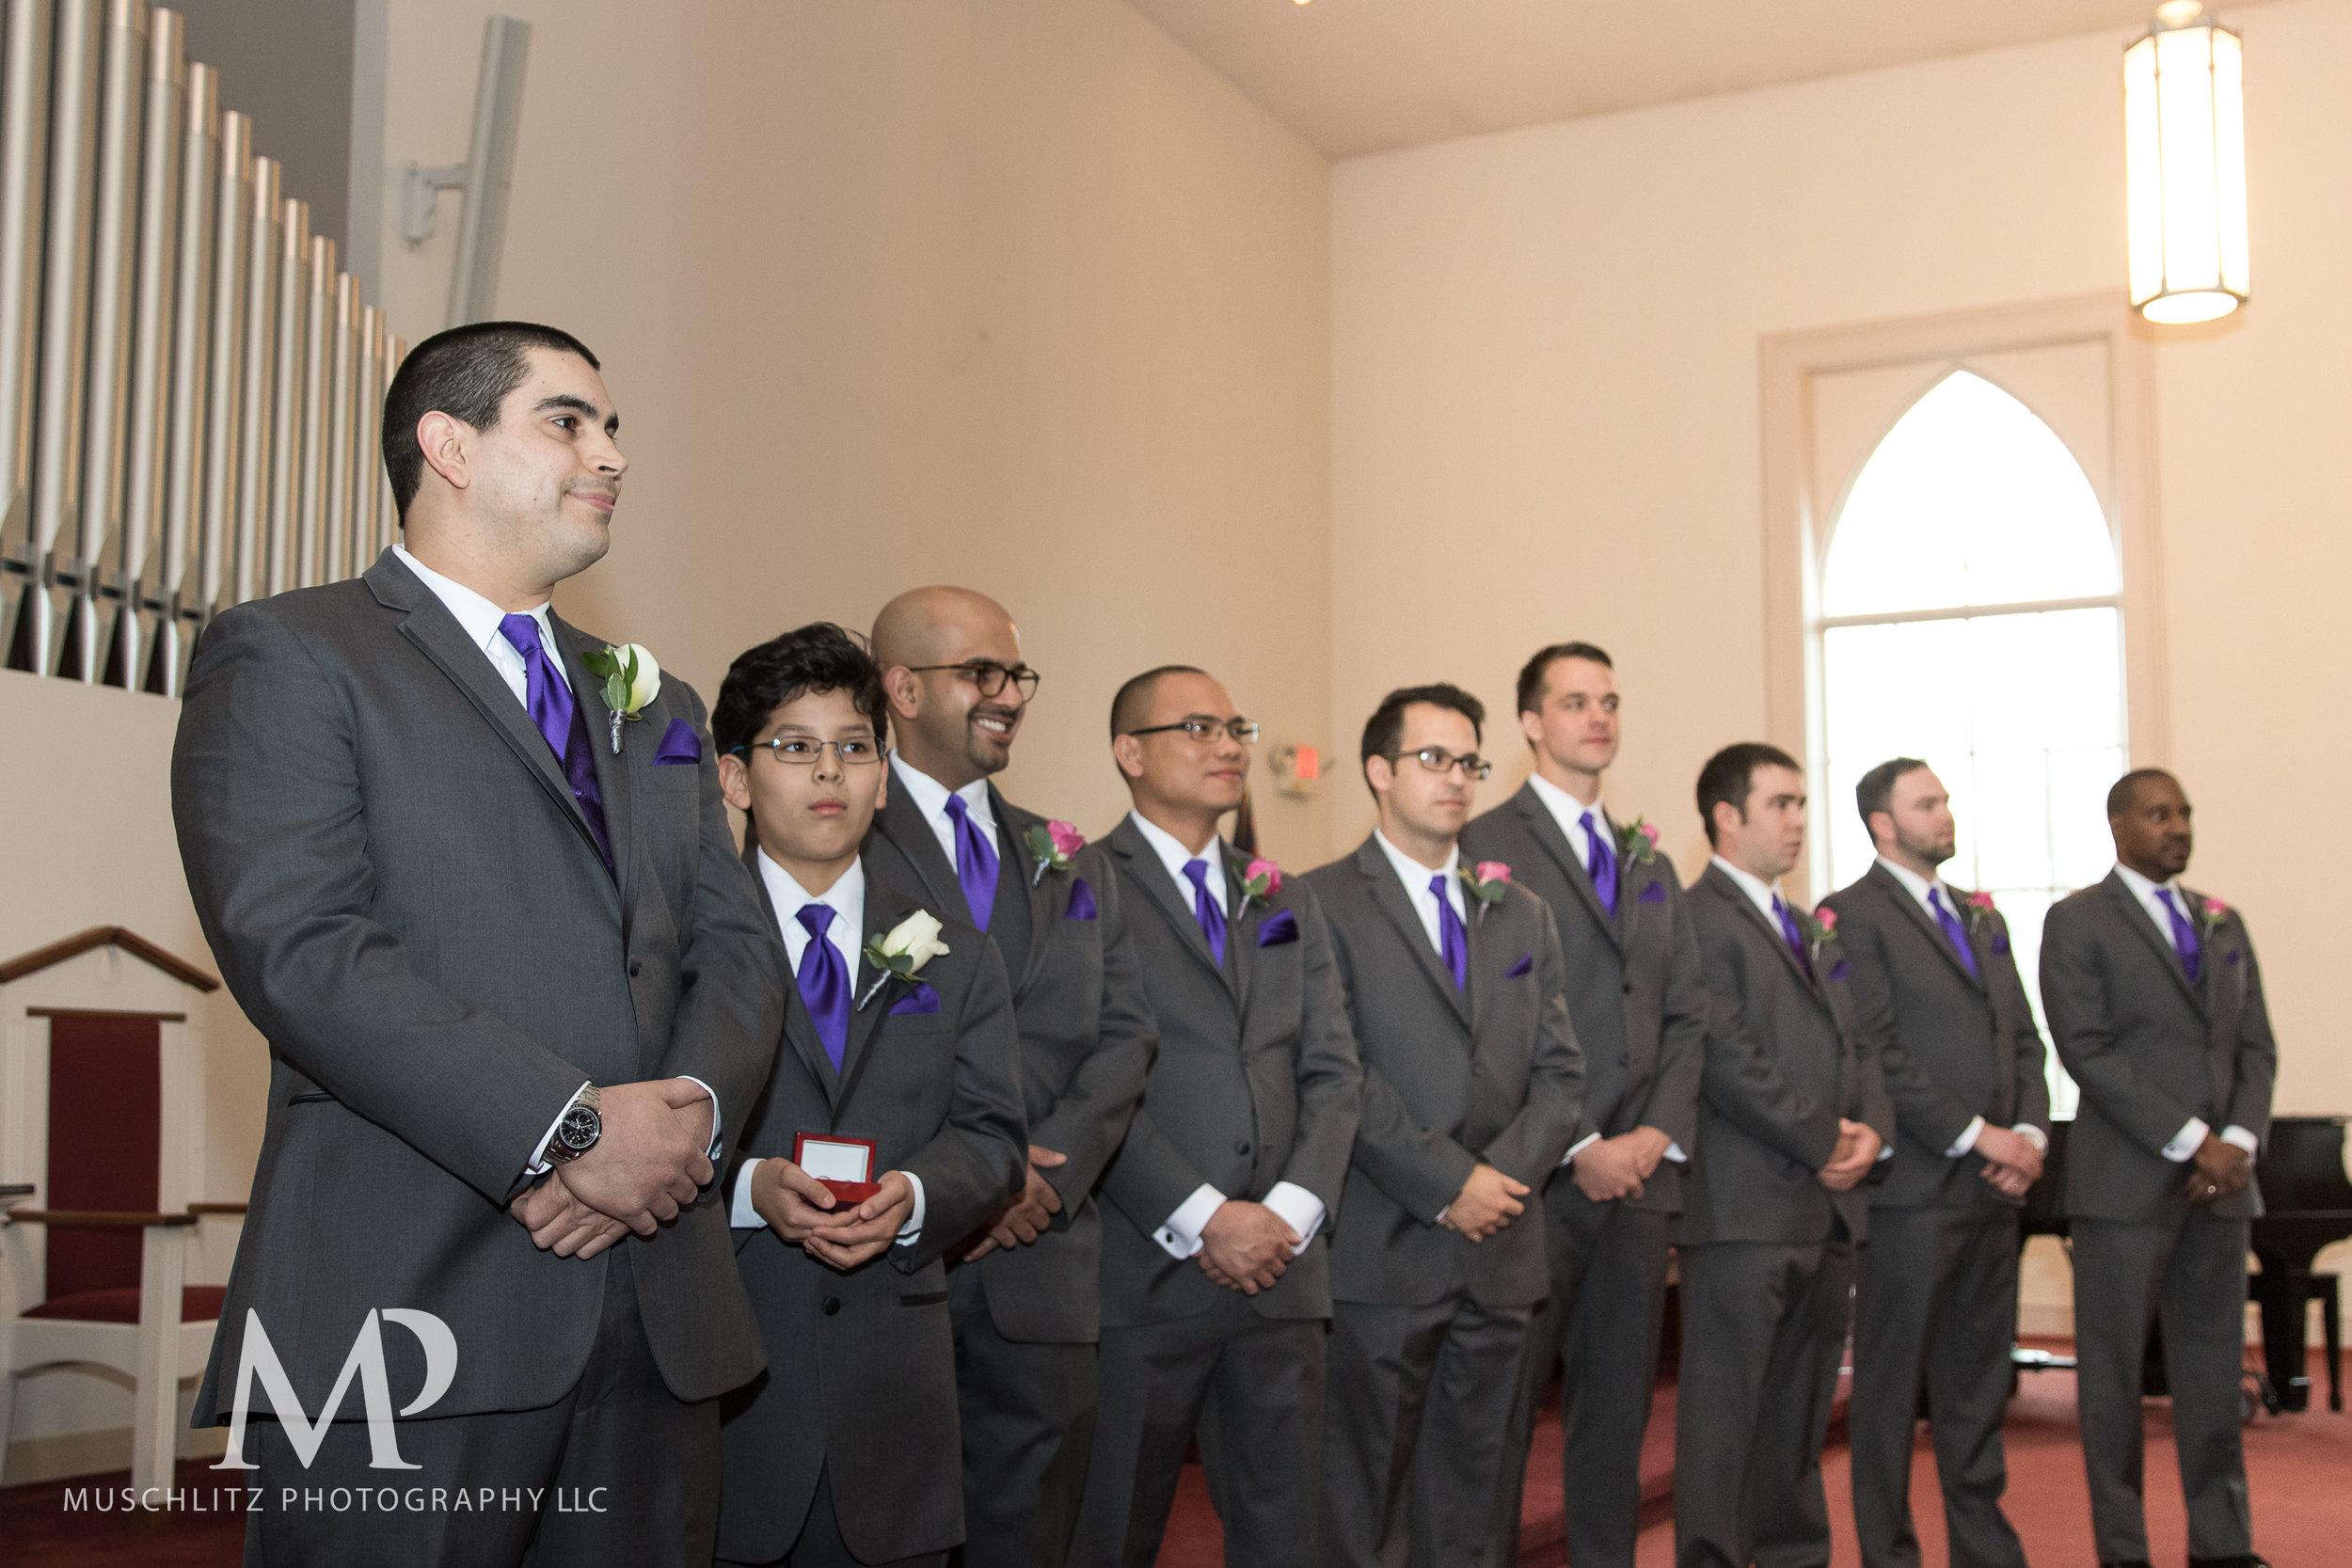 dublin-community-church-wedding-columbus-ohio-muschlitz-photography-030.JPG